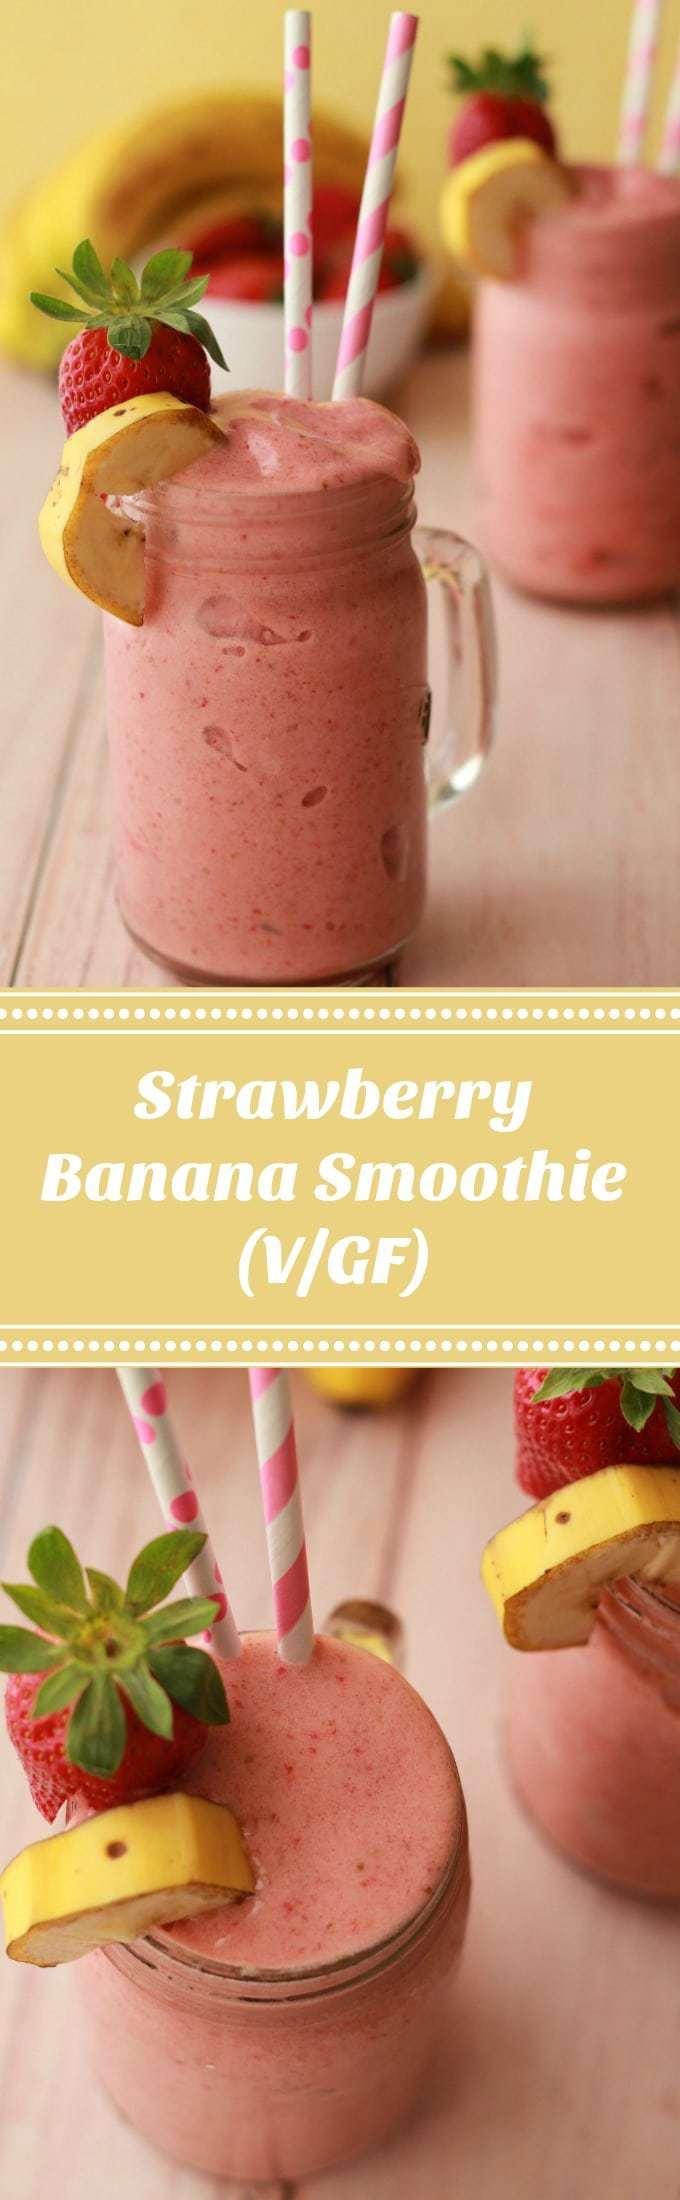 Strawberry Banana Smoothie #vegan #strawberrybanana #smoothies #glutenfree #dairyfree